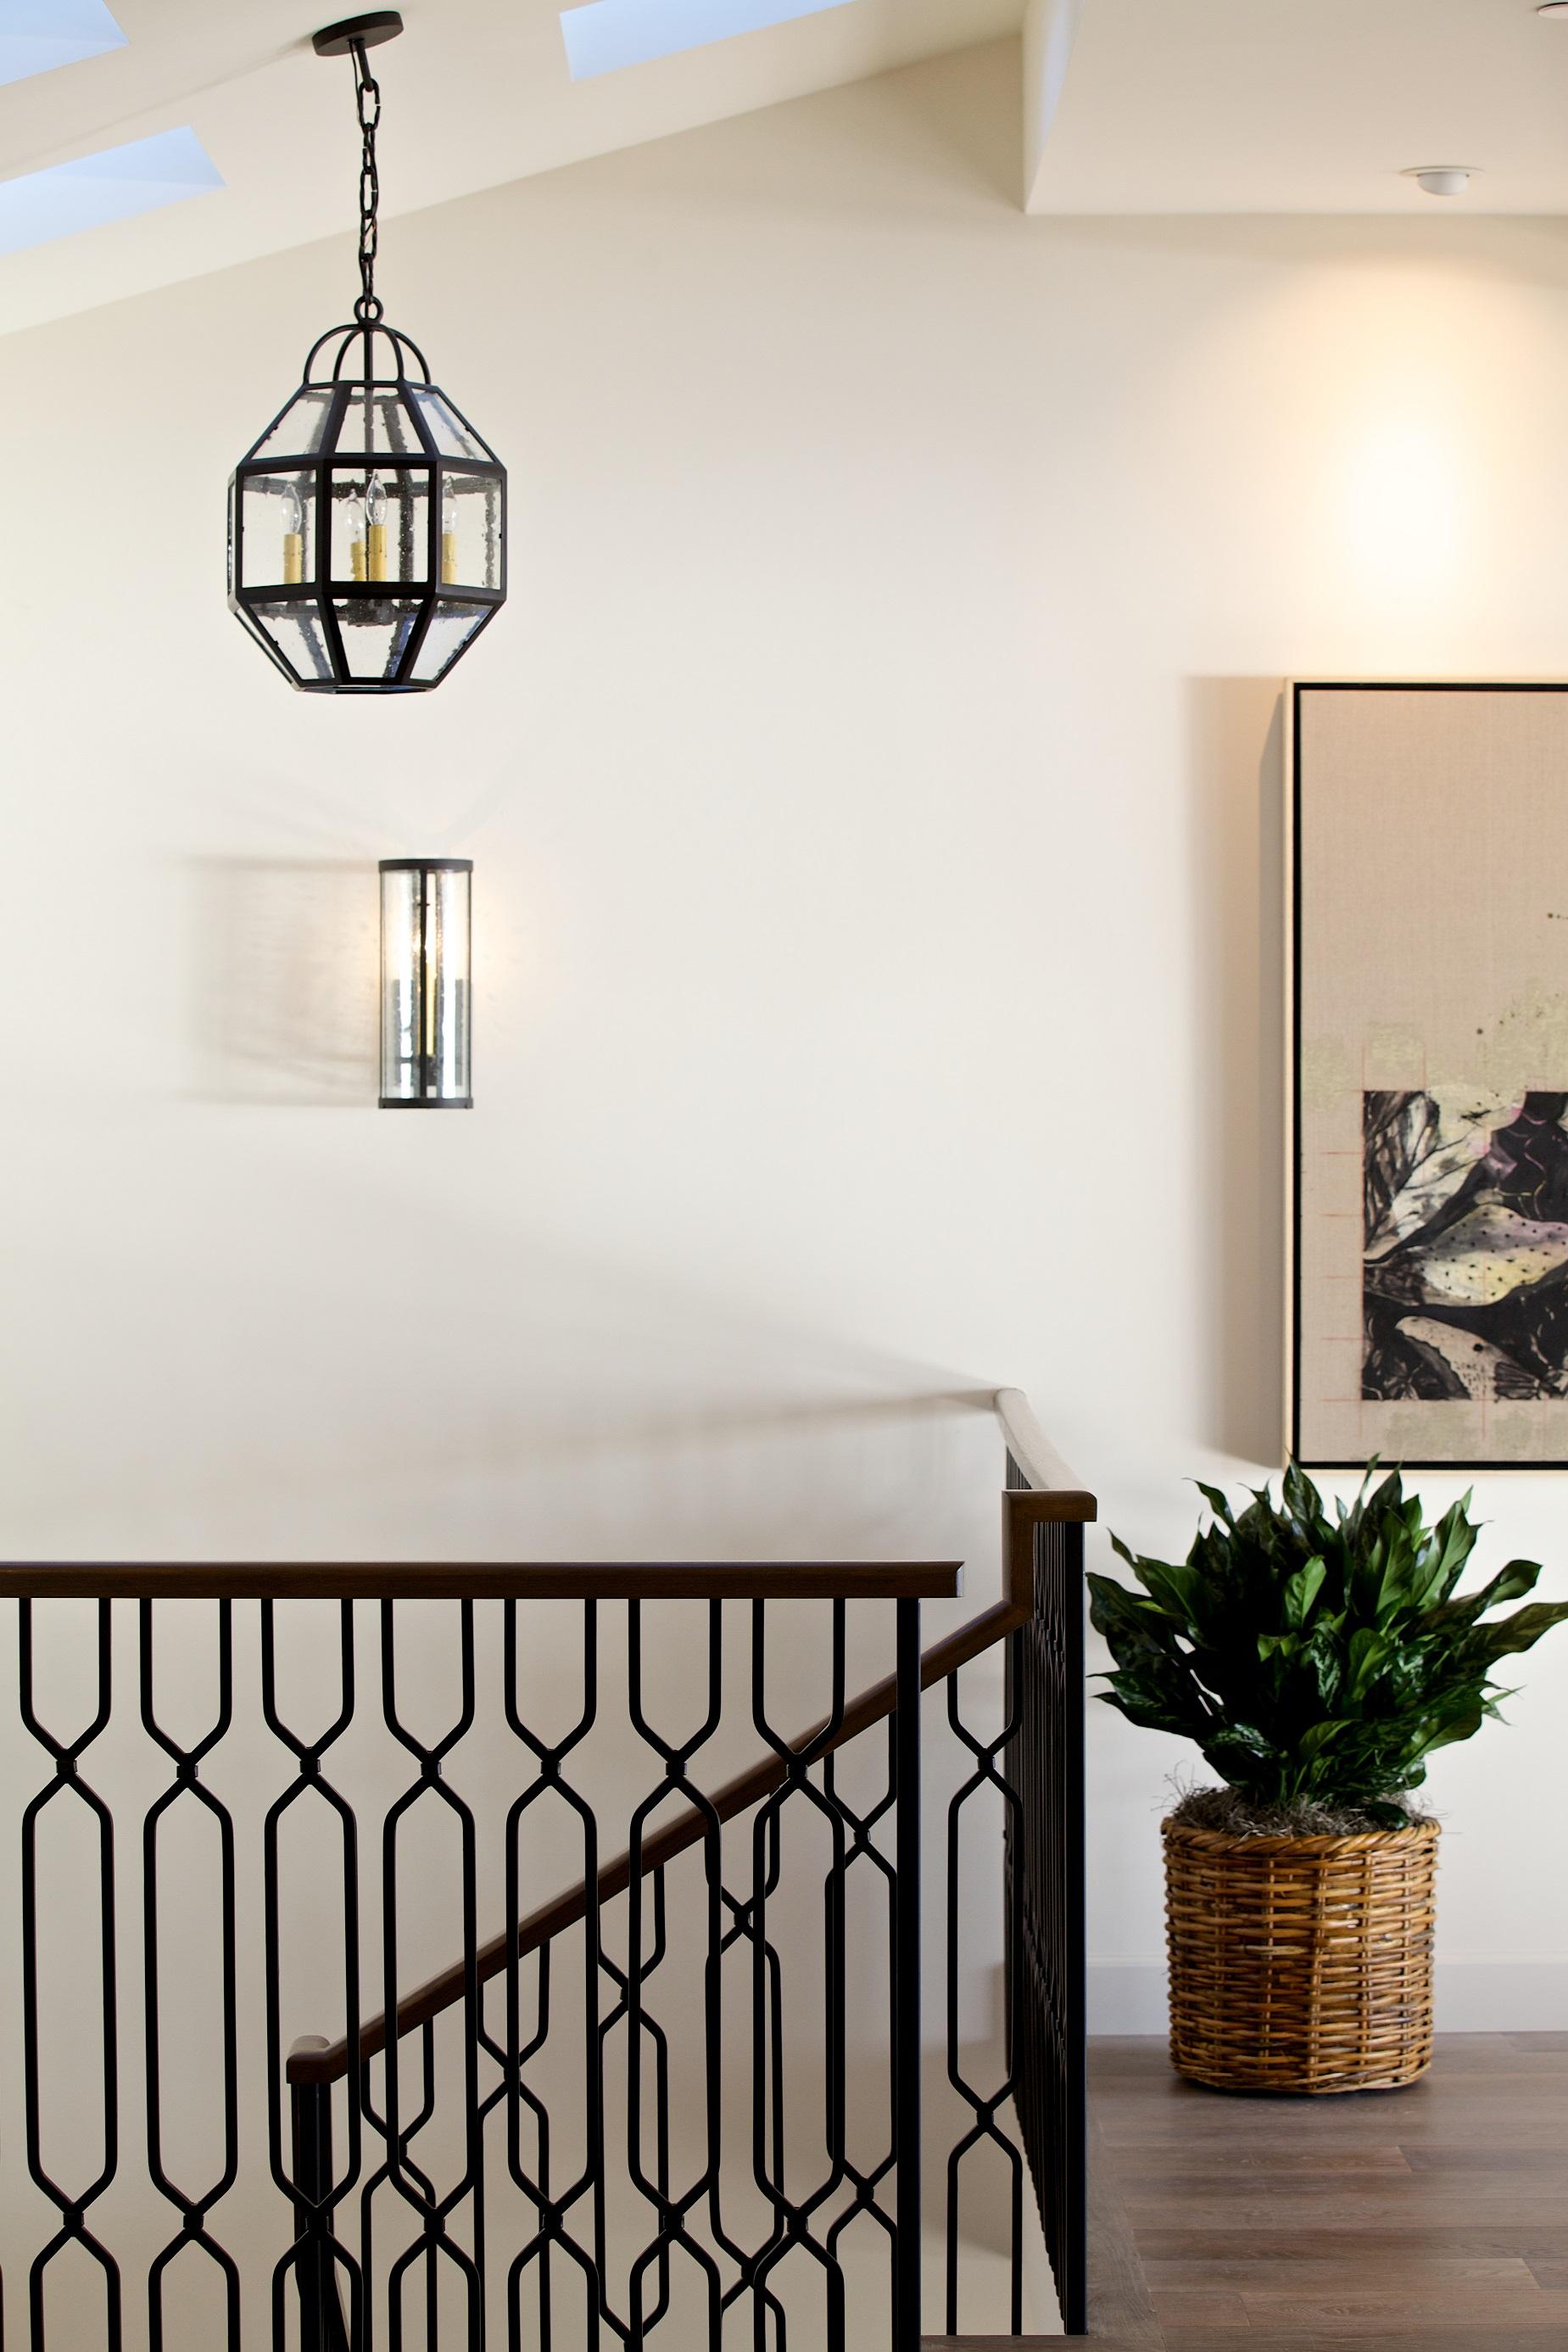 Custom Iron Pendant Light & Wall Sconce